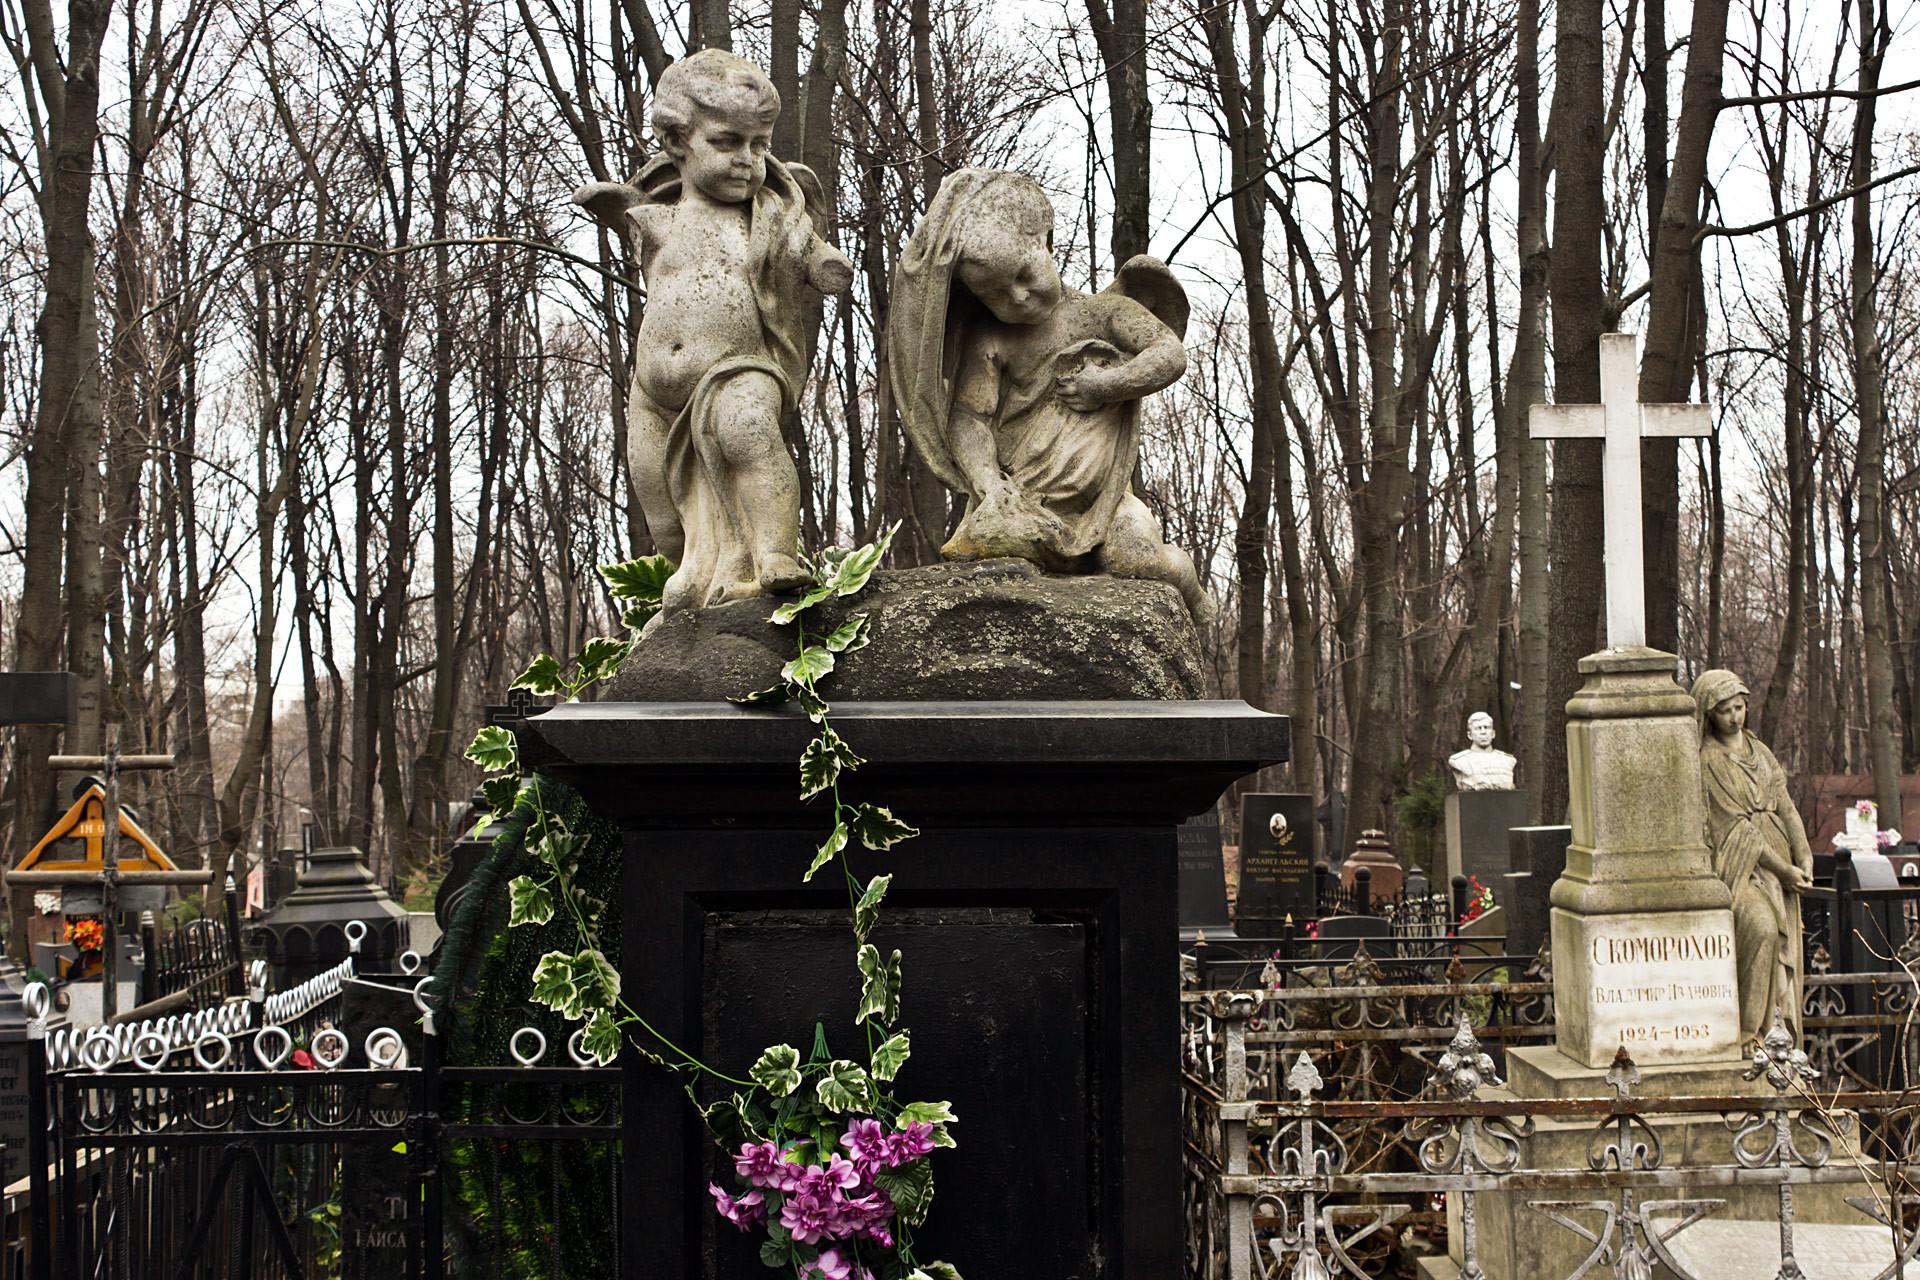 Vvedenskoye cemetery, Moscow, Russia